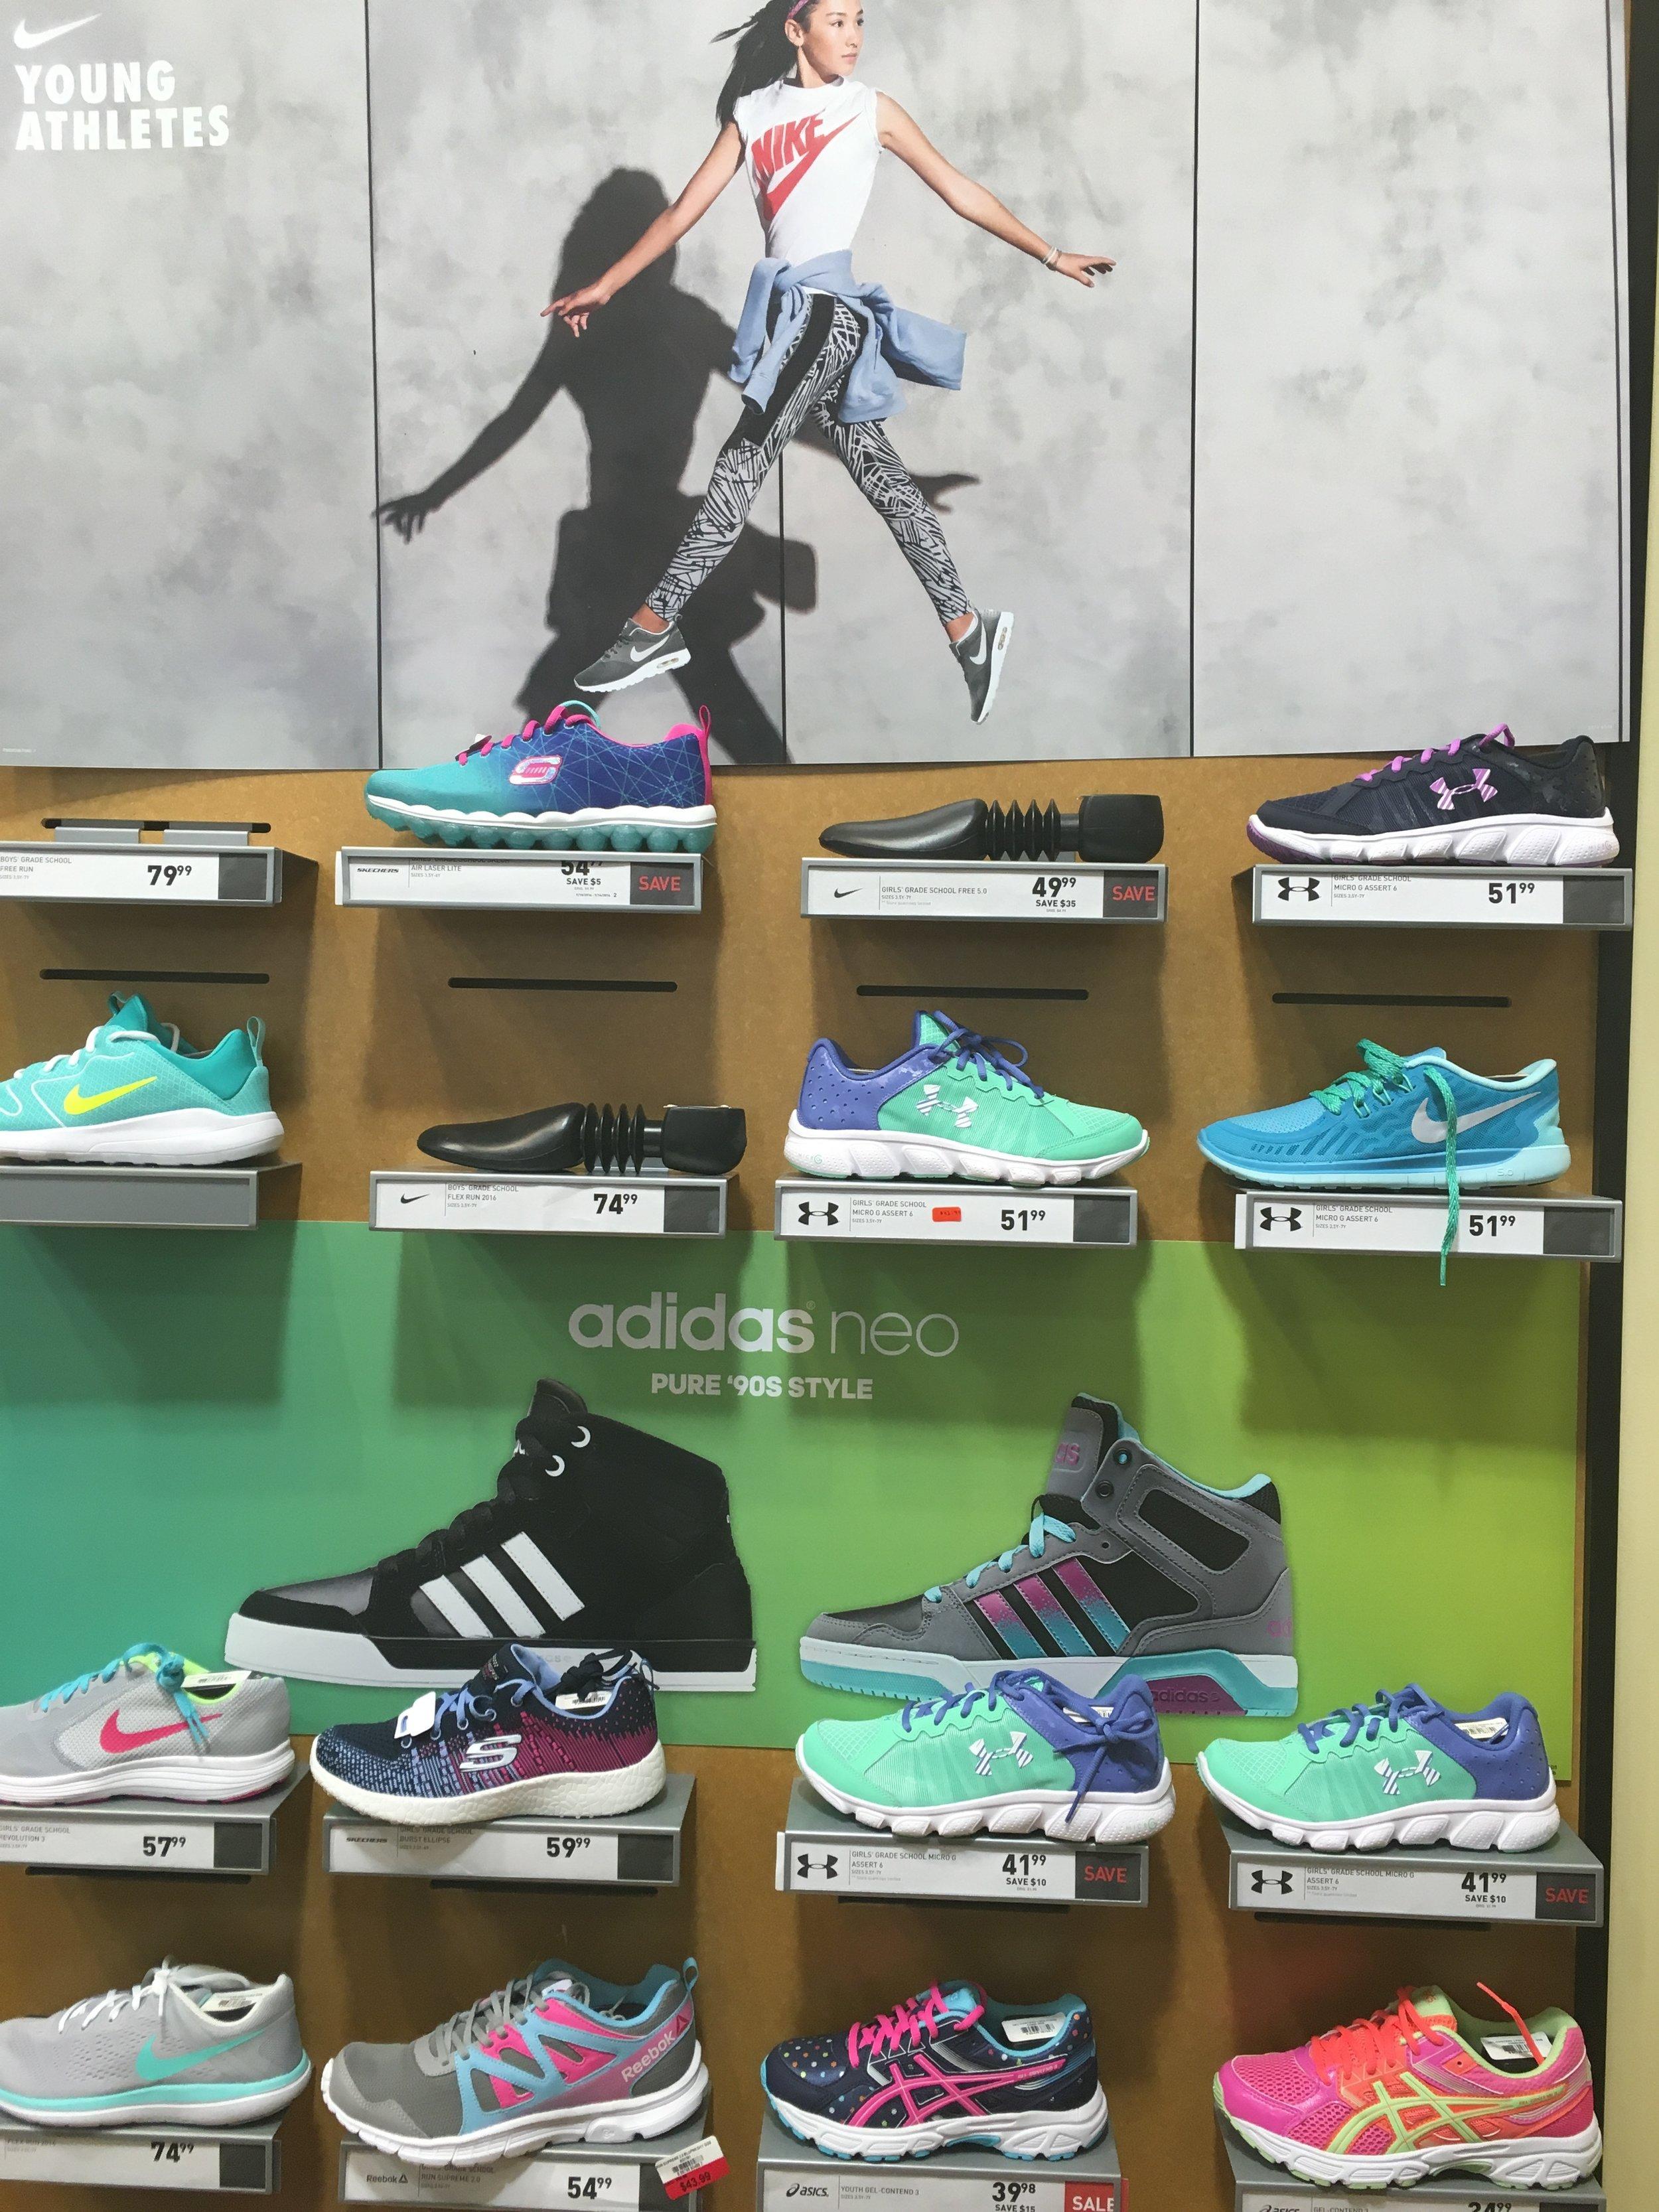 cute kids athletic shoes